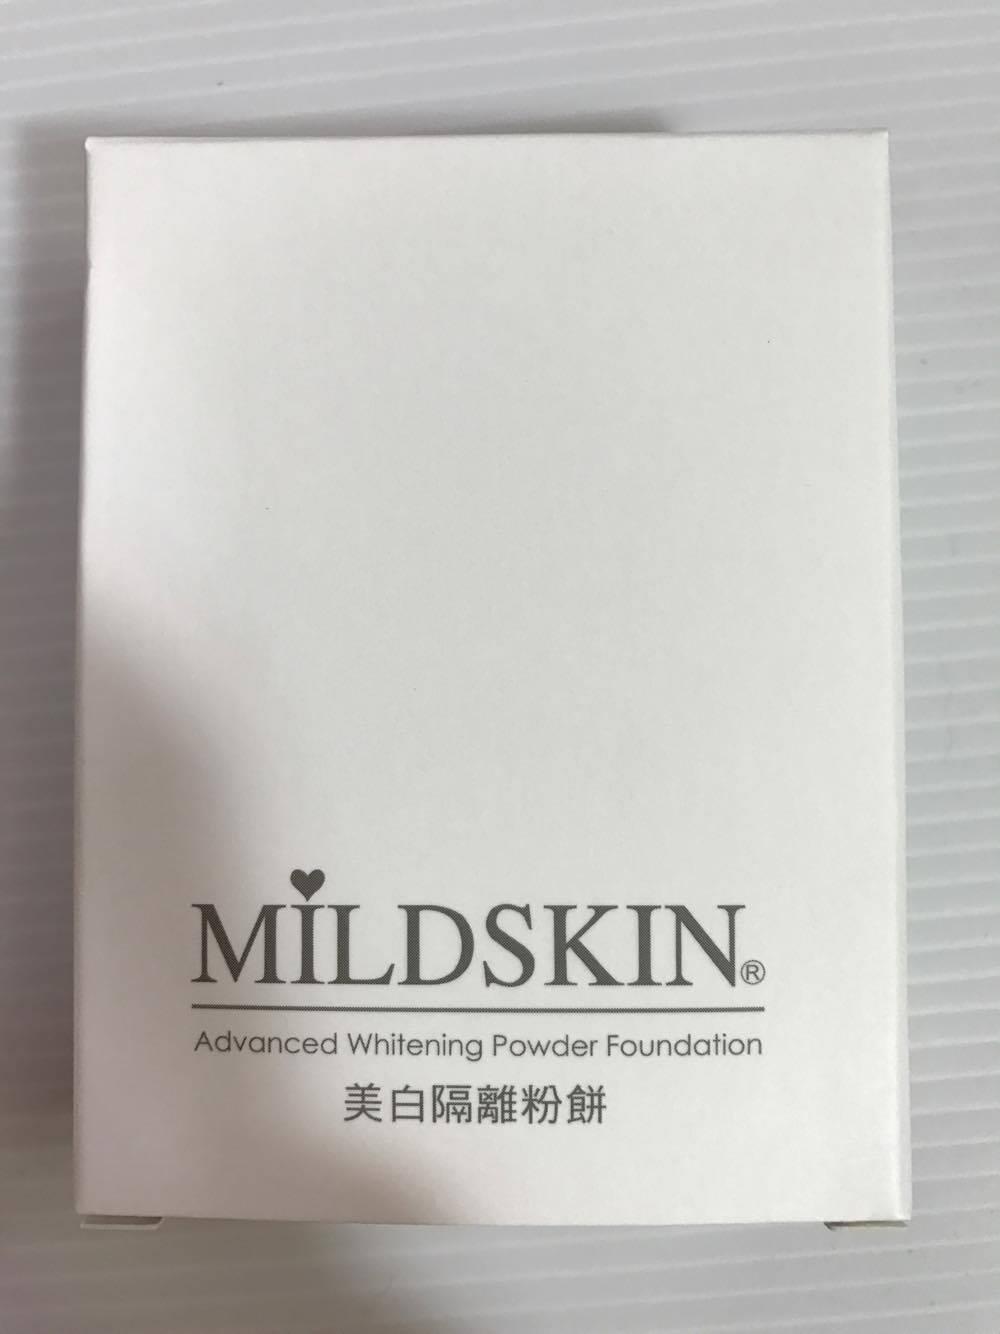 【MILDSKIN】美白隔離粉餅 SPF37PA★★★★★ 10g 效期2019 【淨妍美肌】